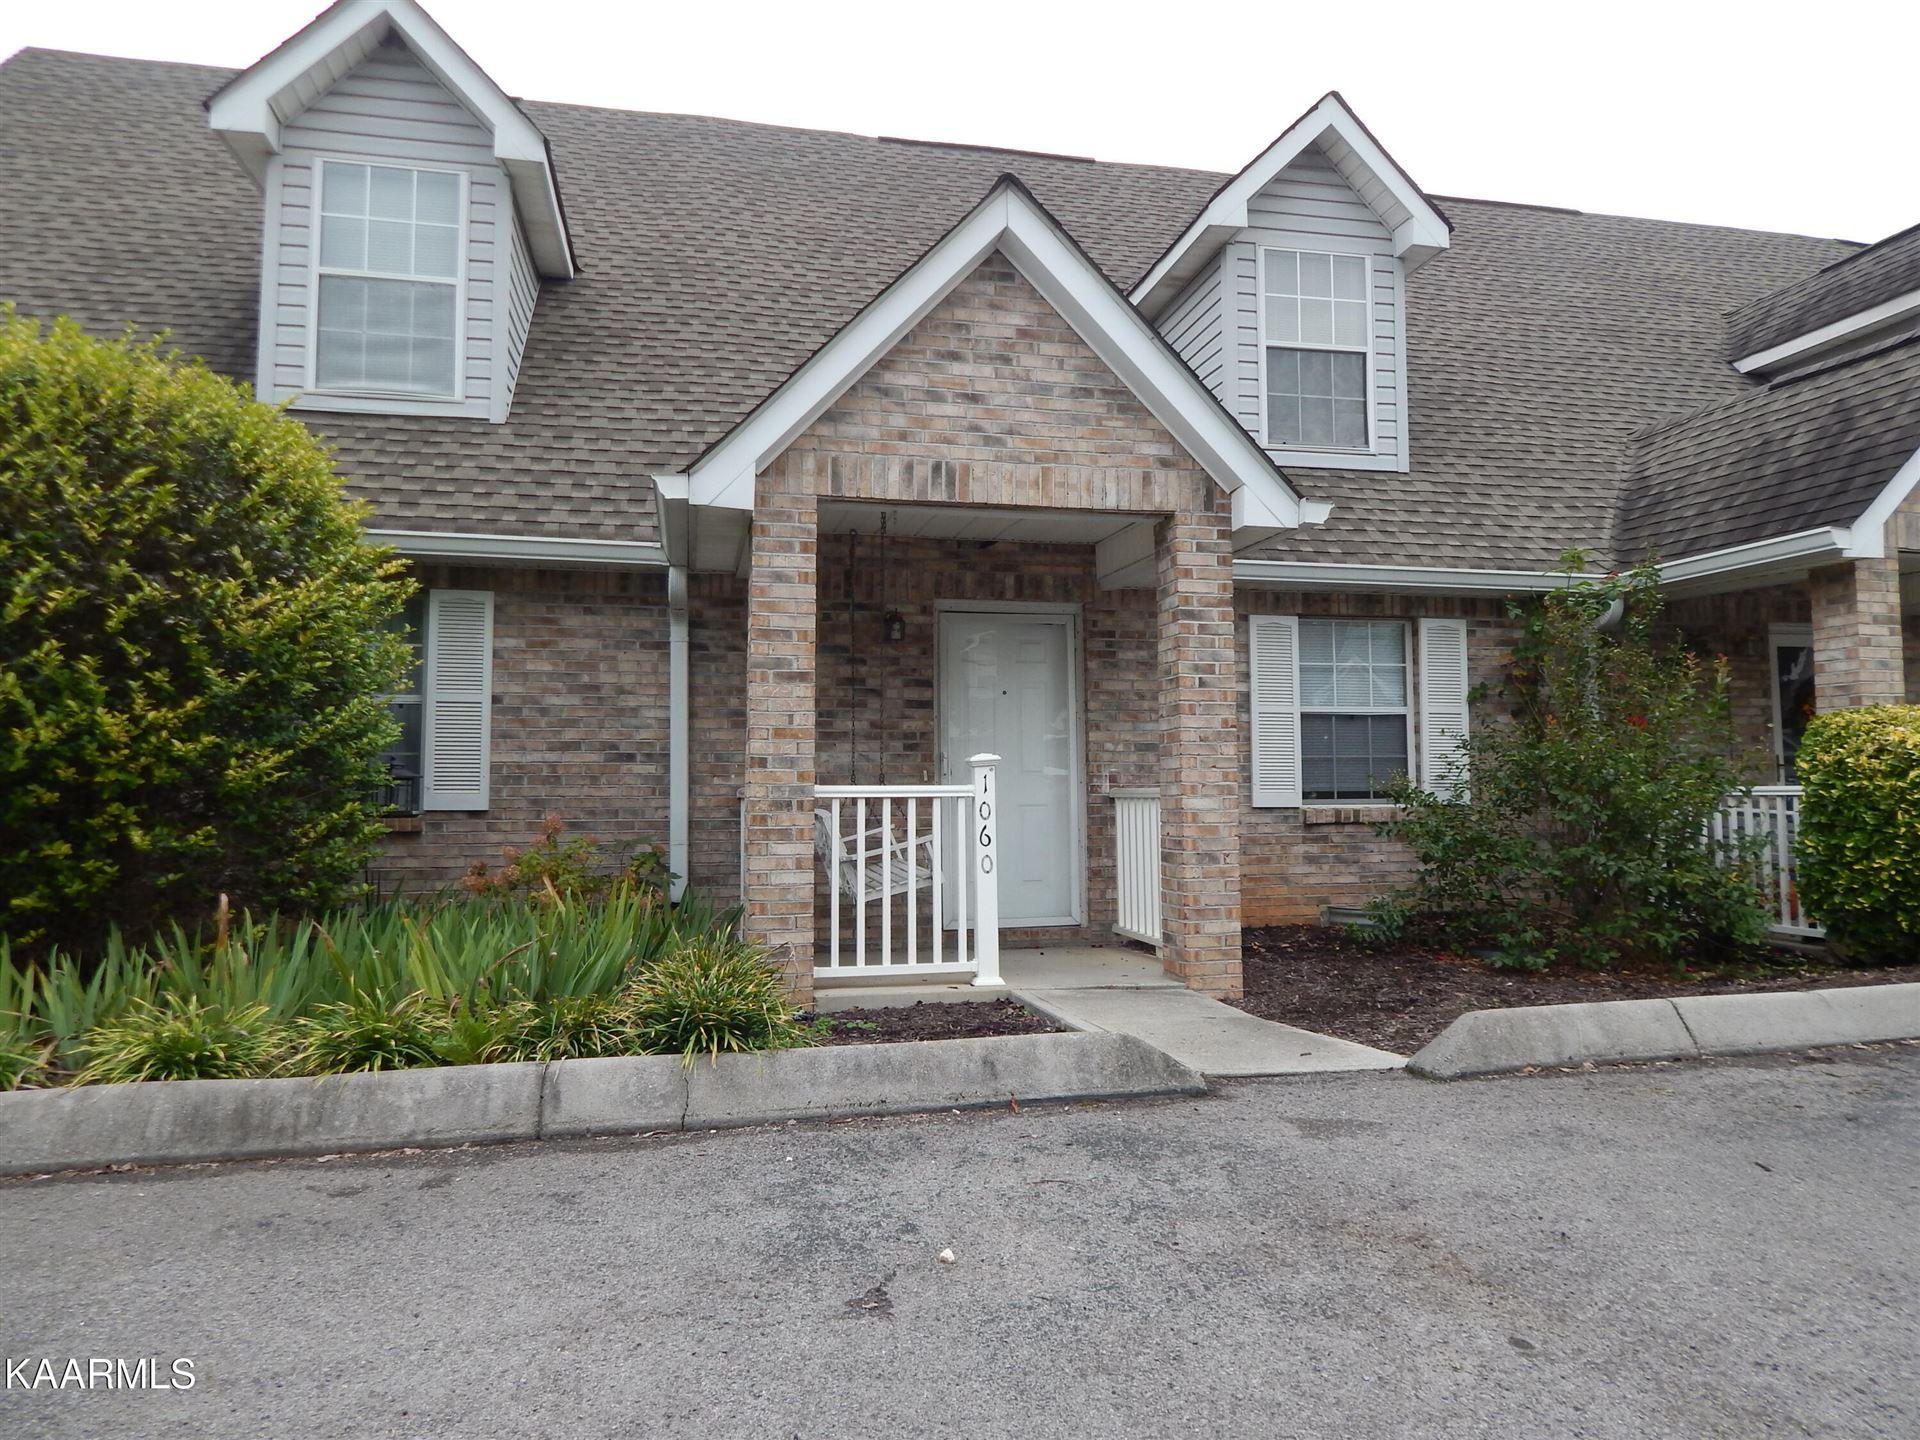 Photo of 1060 Blinken St, Knoxville, TN 37932 (MLS # 1171735)